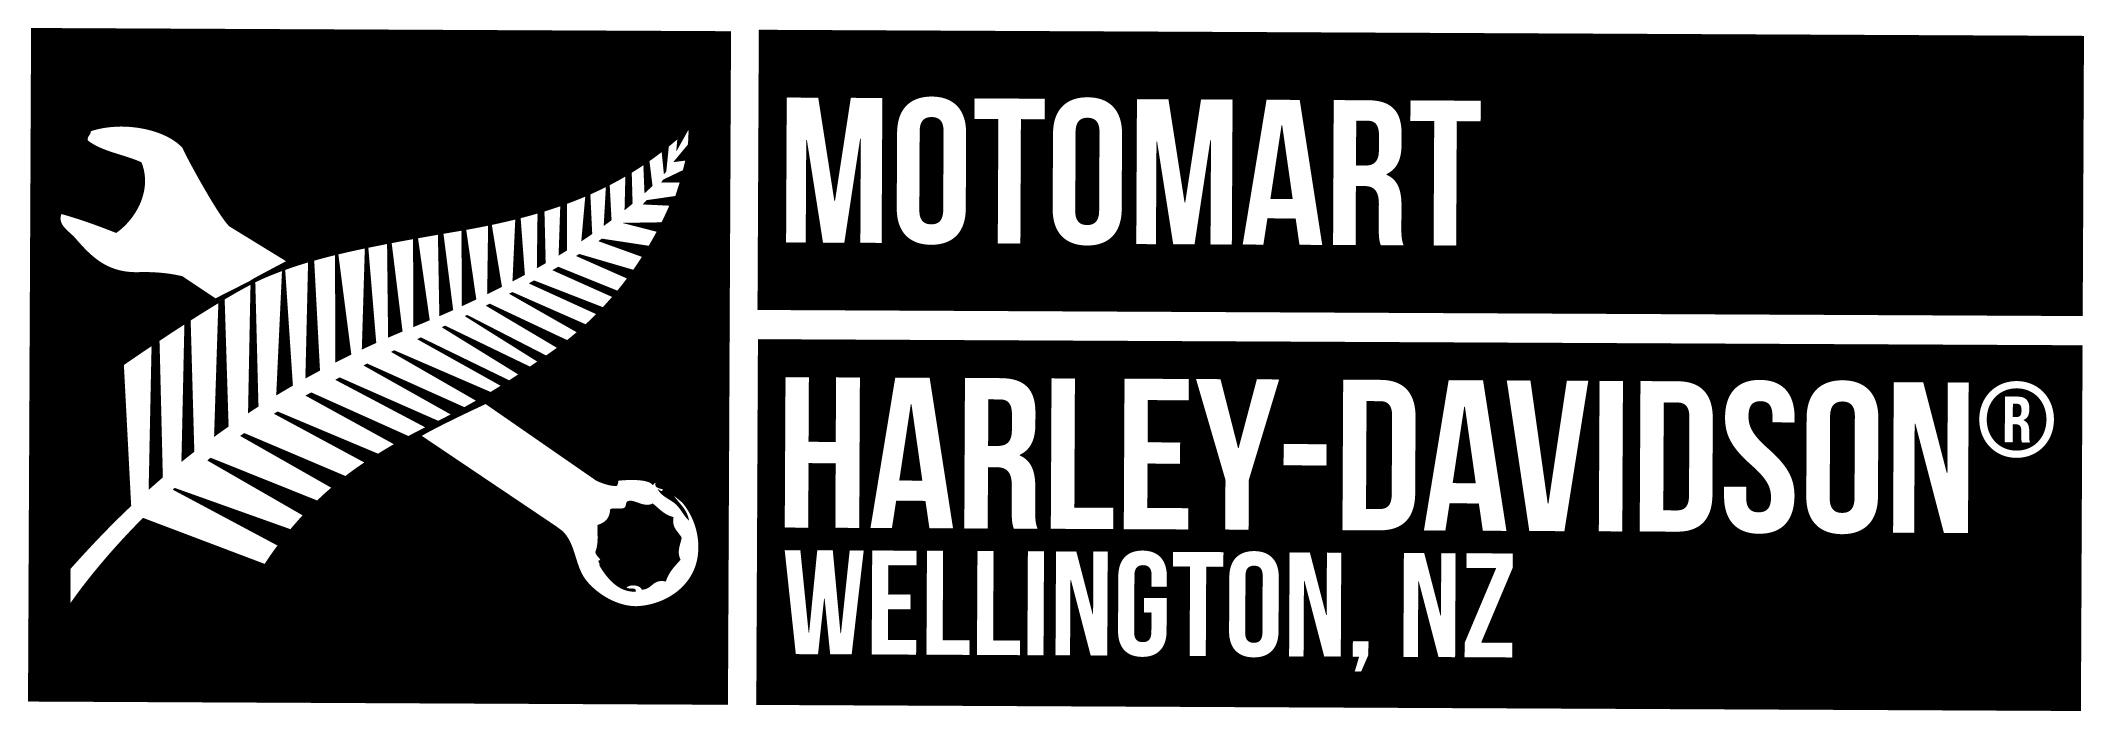 Motomart Harley-Davidson<sup>®</sup>